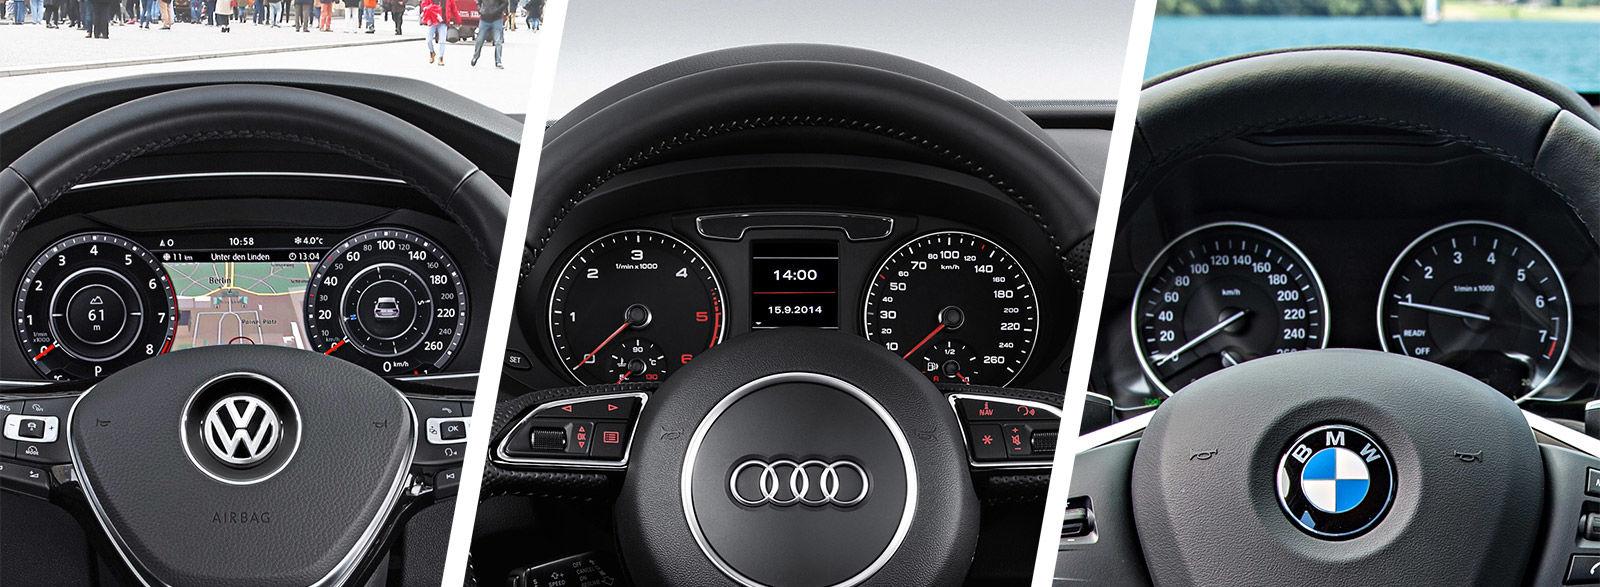 VW Tiguan vs Audi Q3 vs BMW X1 comparison | carwow